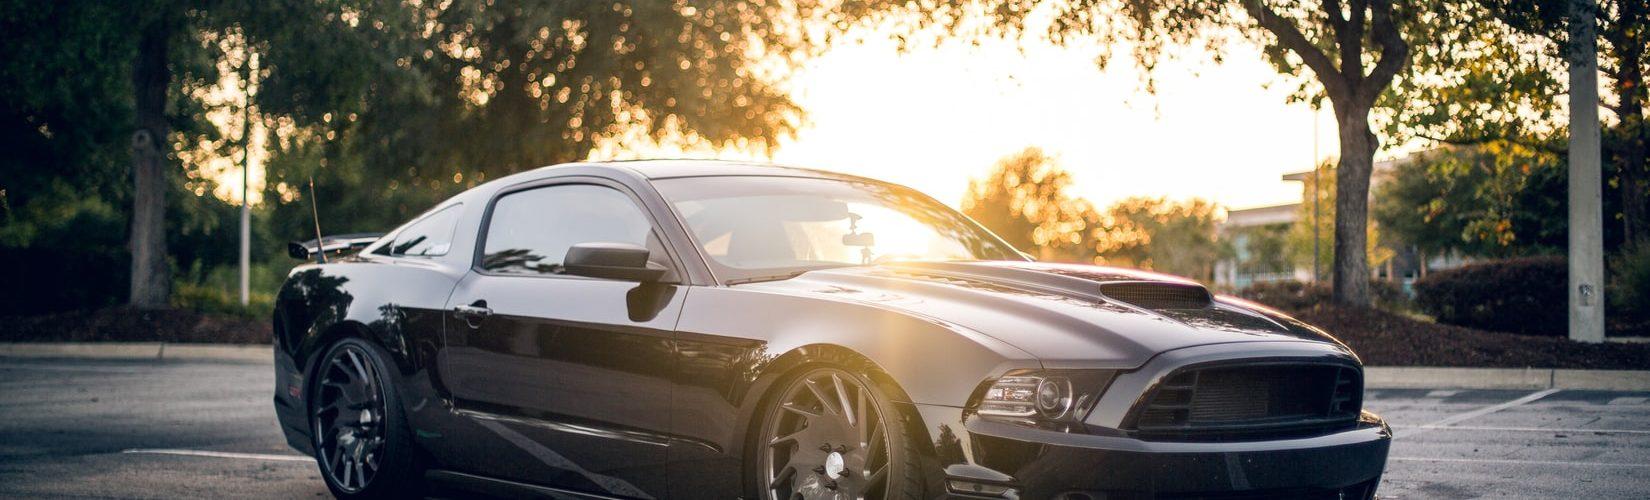 zwarte-auto